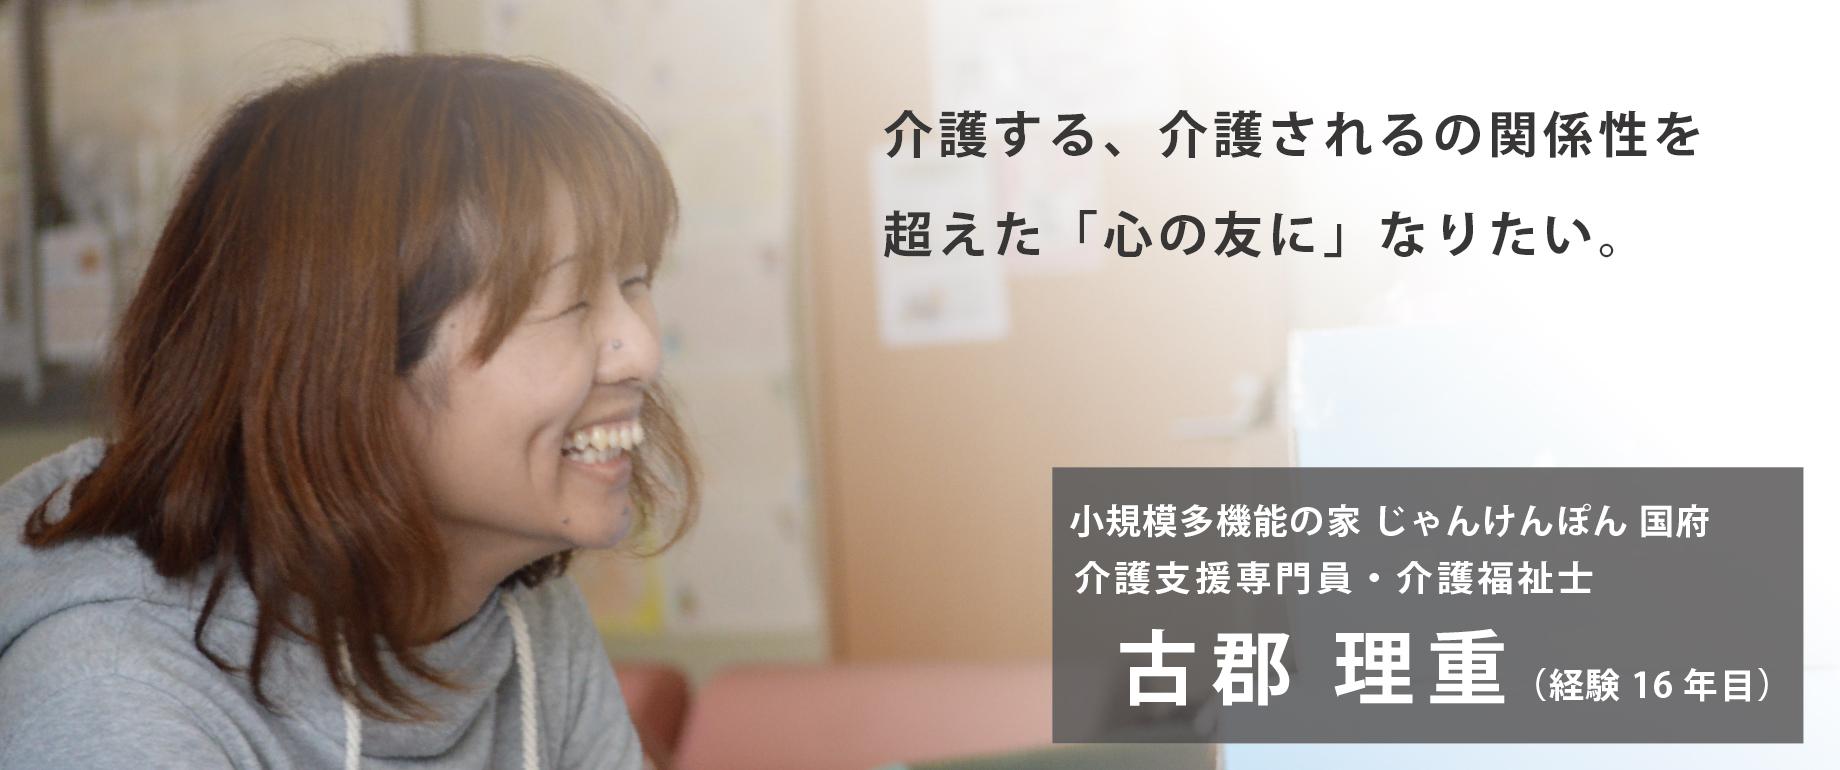 05_furukori